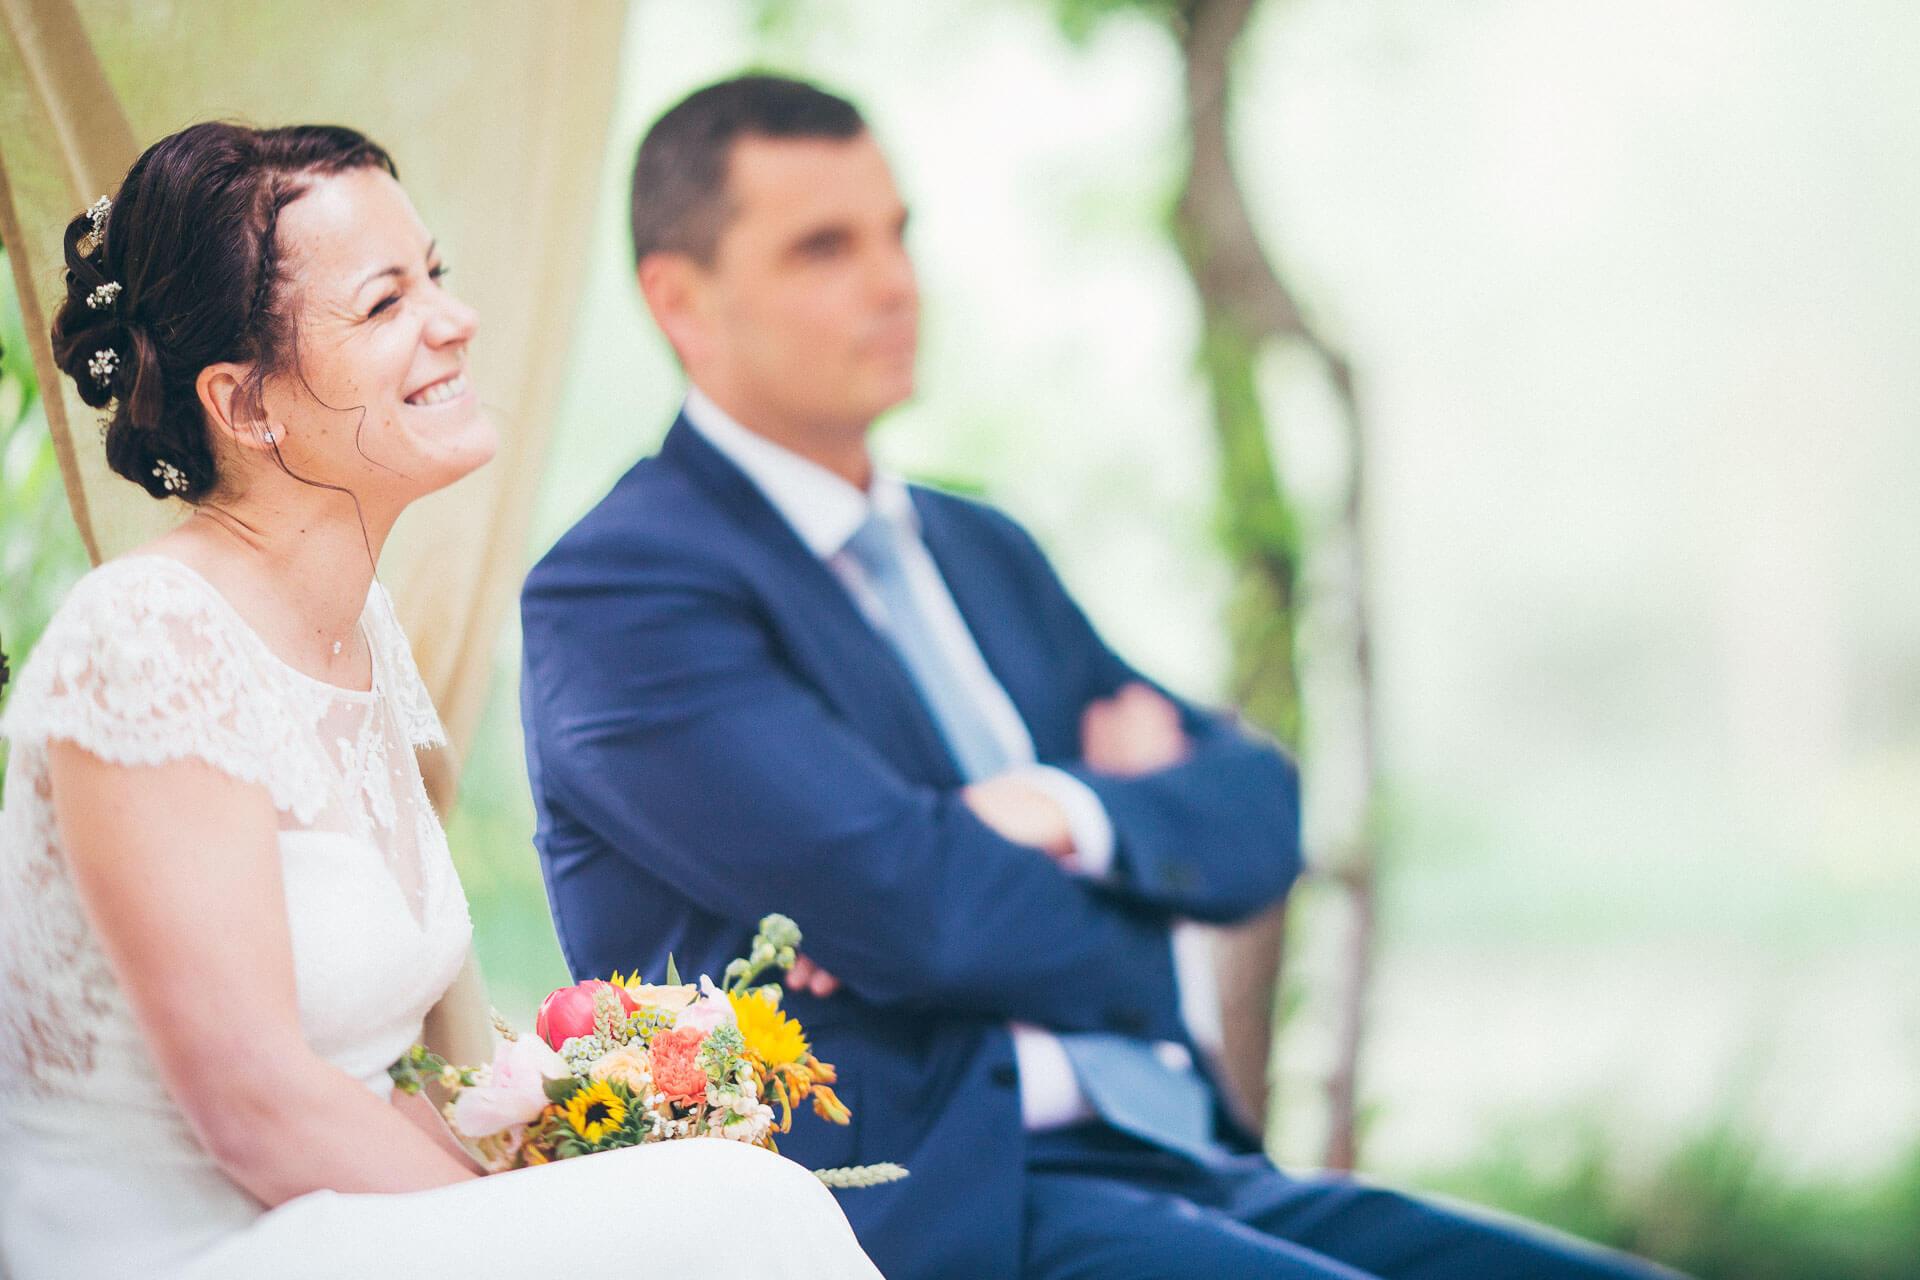 Photographe mariage montpellier champetre-15